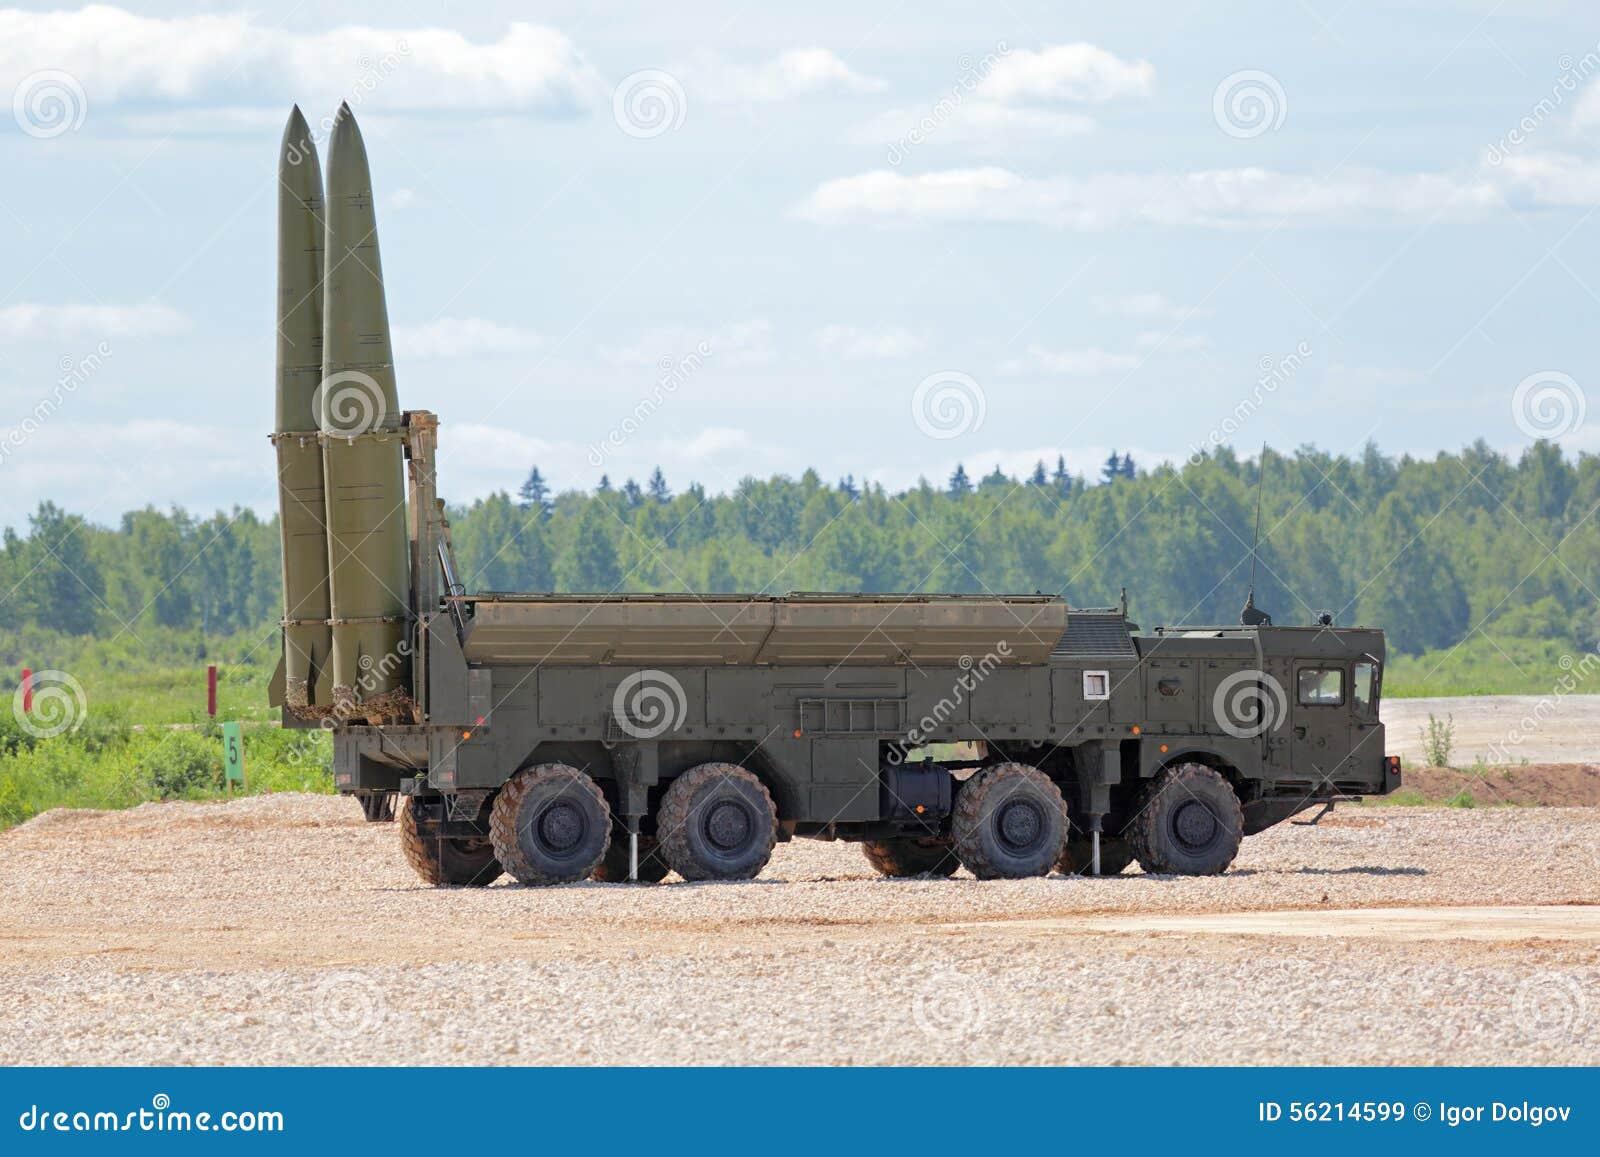 9K720 Iskander (SS-26 Stone) E...